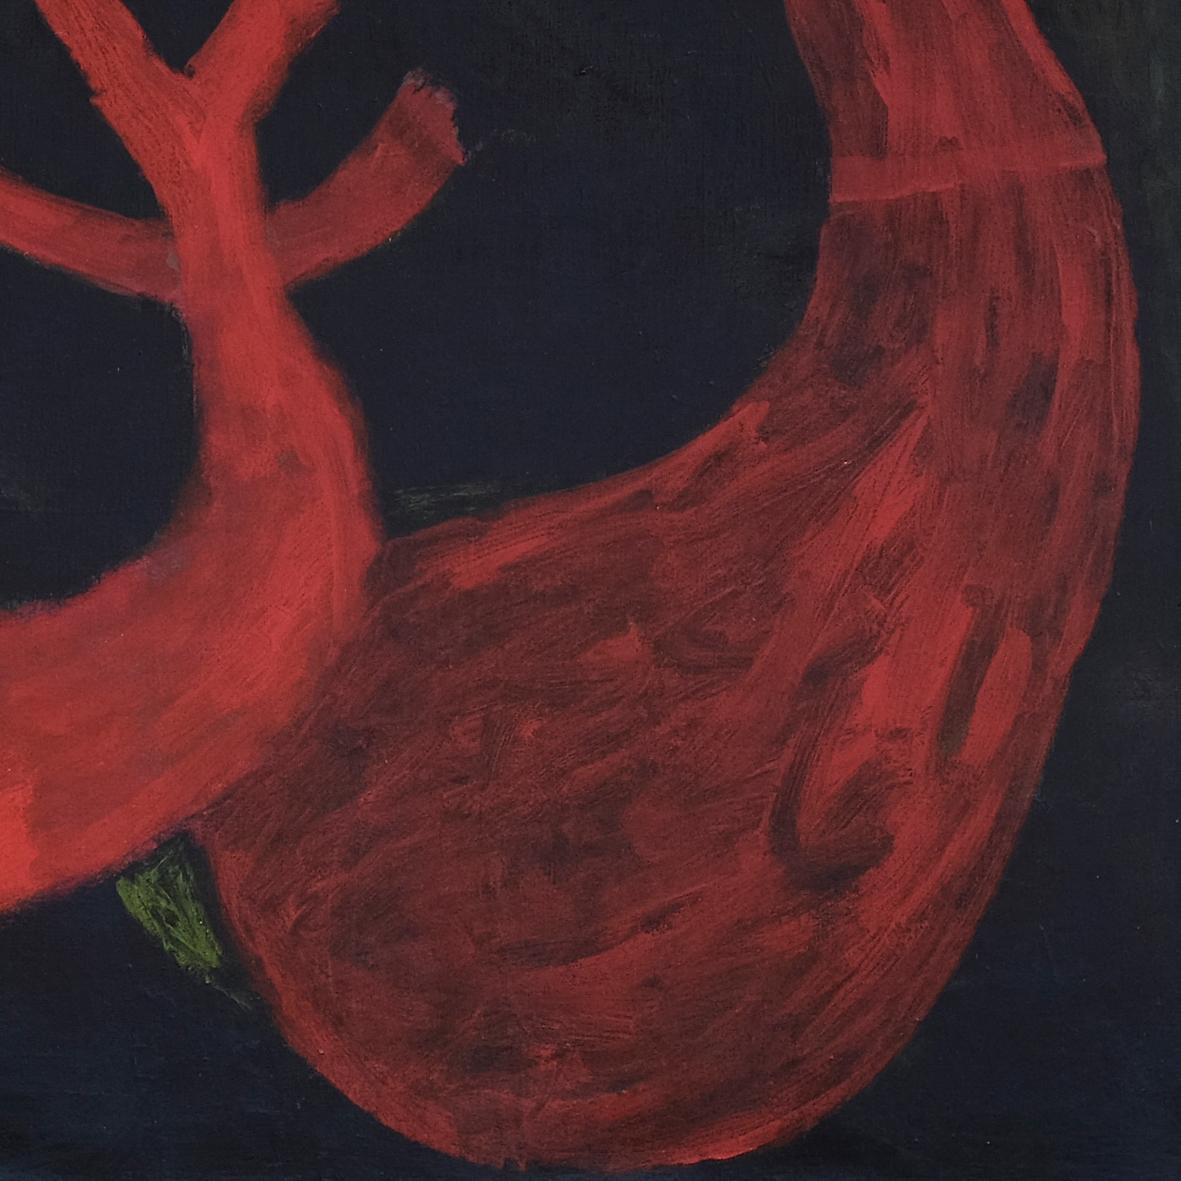 Nashar, Nyayian Malam (Night Song), oil on canvas, 88 x 127 cm, 1977 (detail)